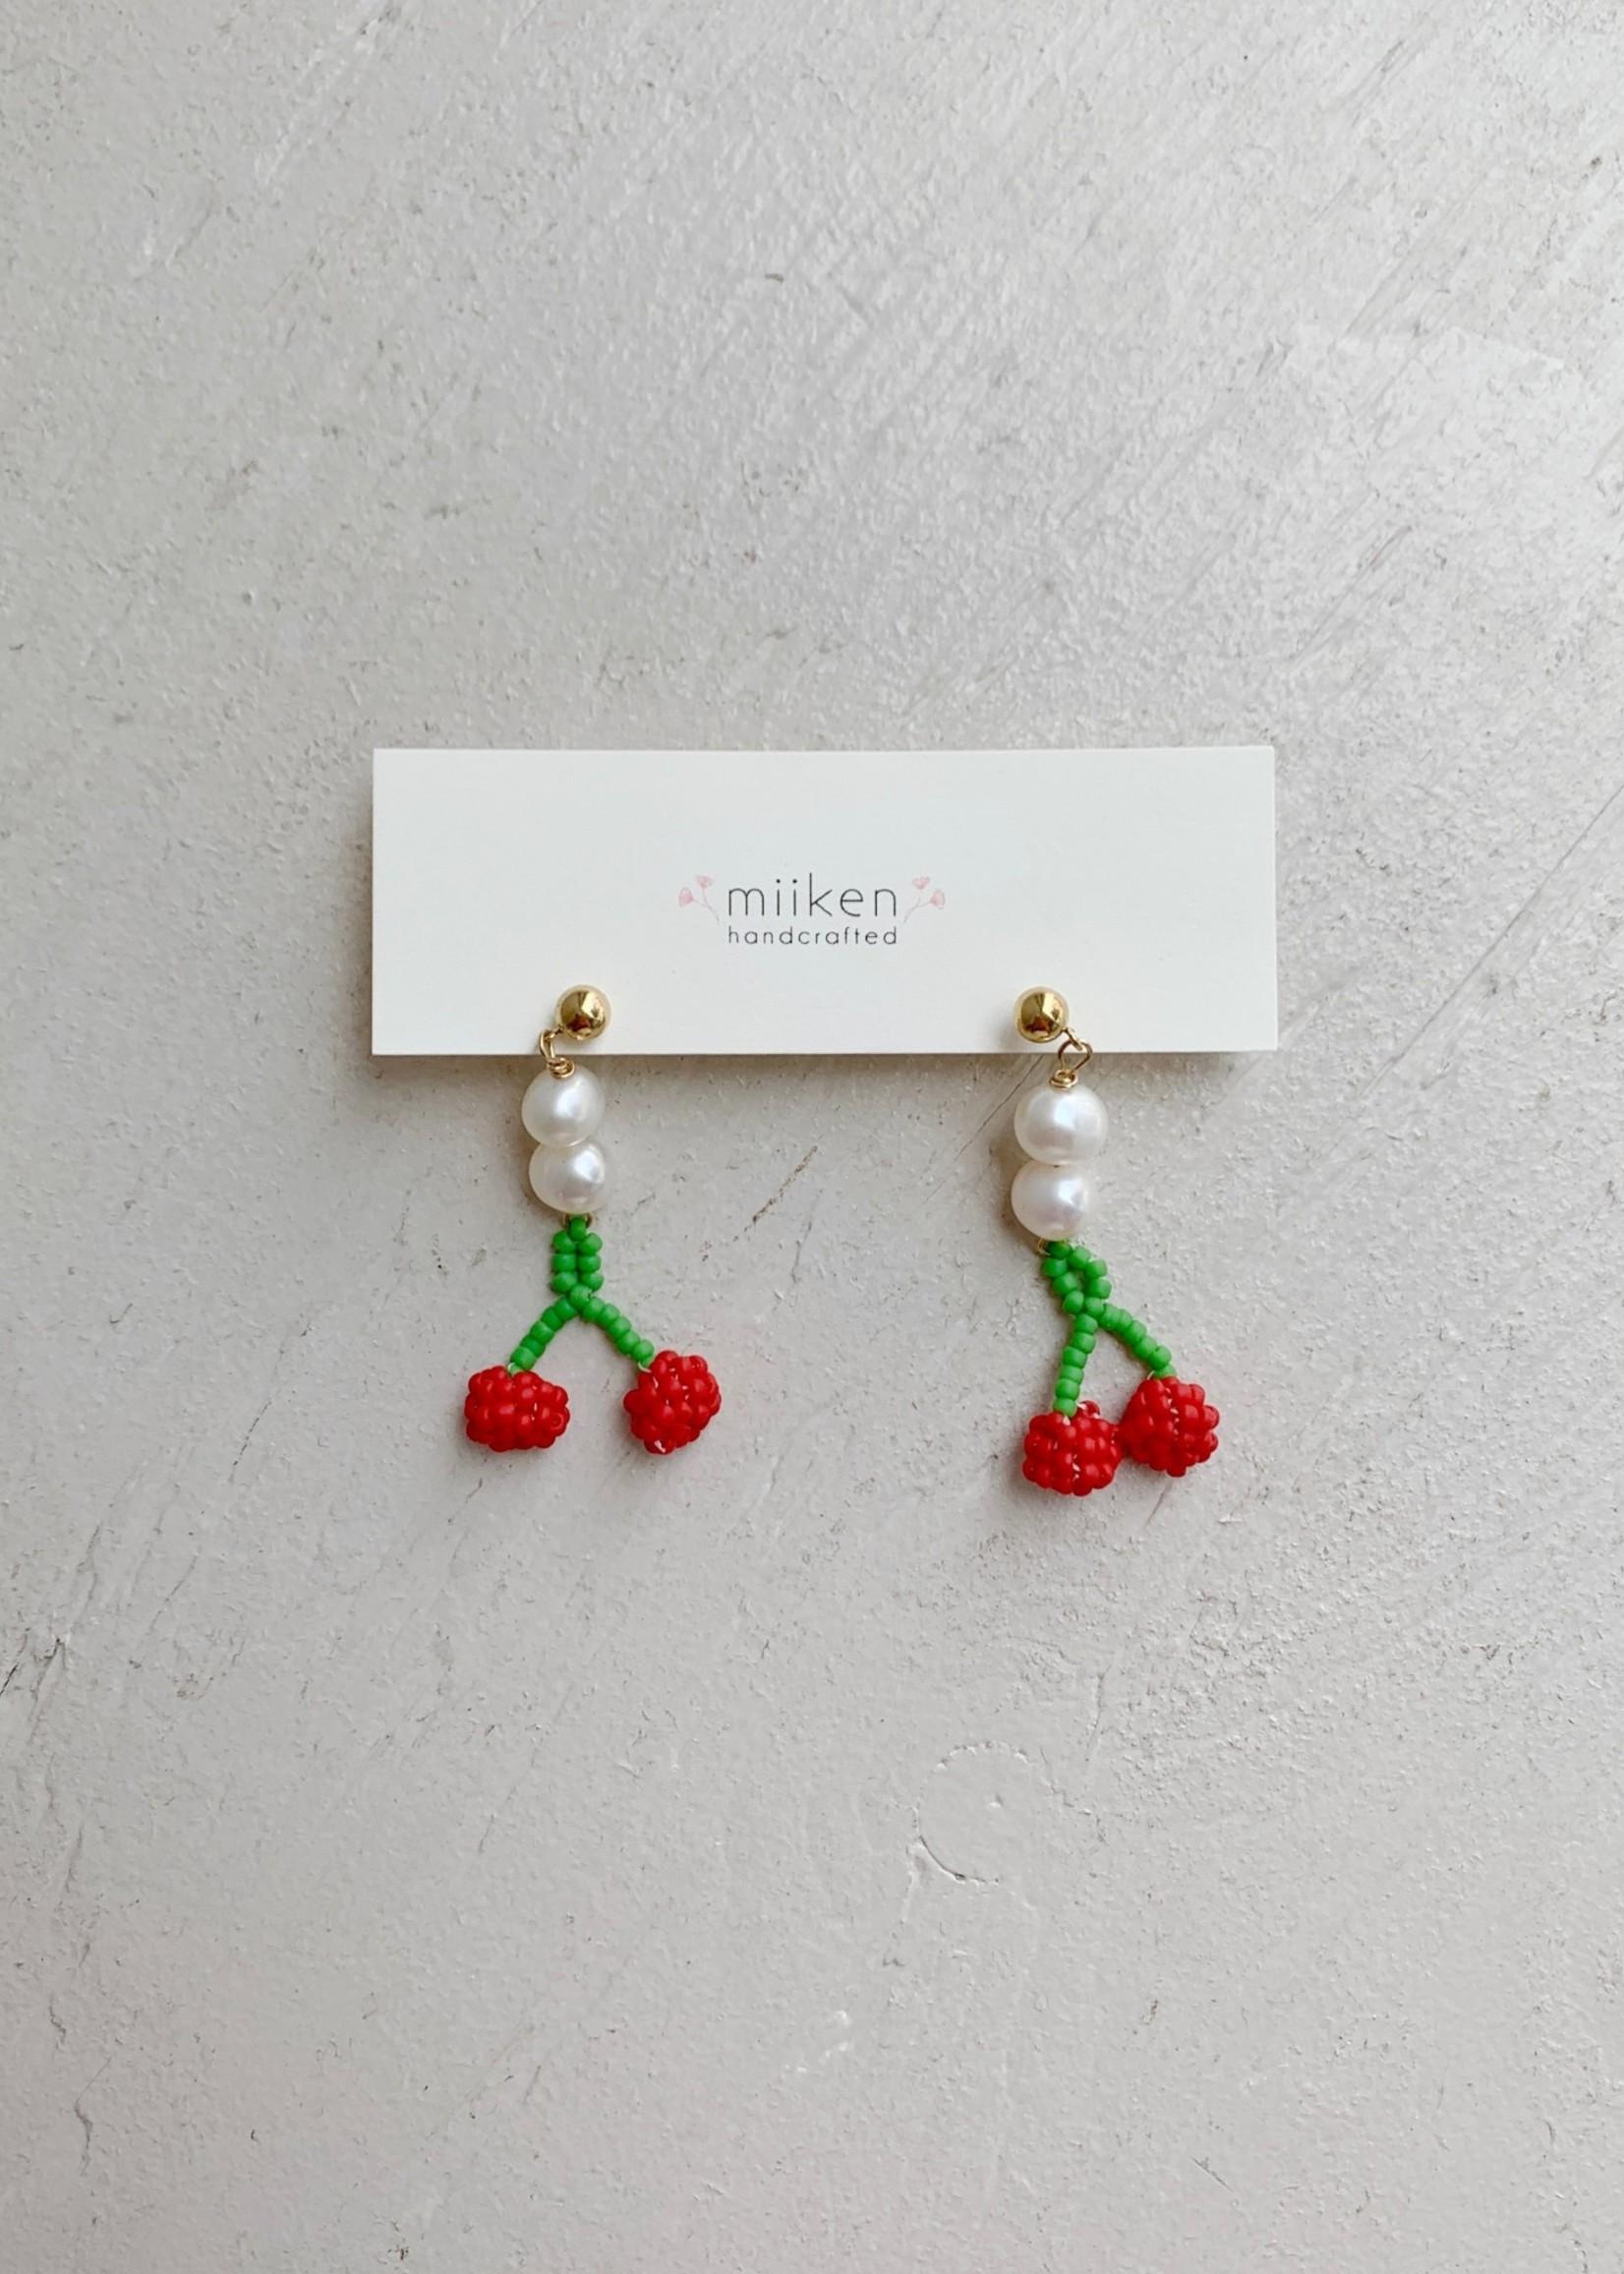 "Miiken Handcrafted Boucle d'oreilles ""Sakura Pearl Drop"" par Miiken Handcrafted"